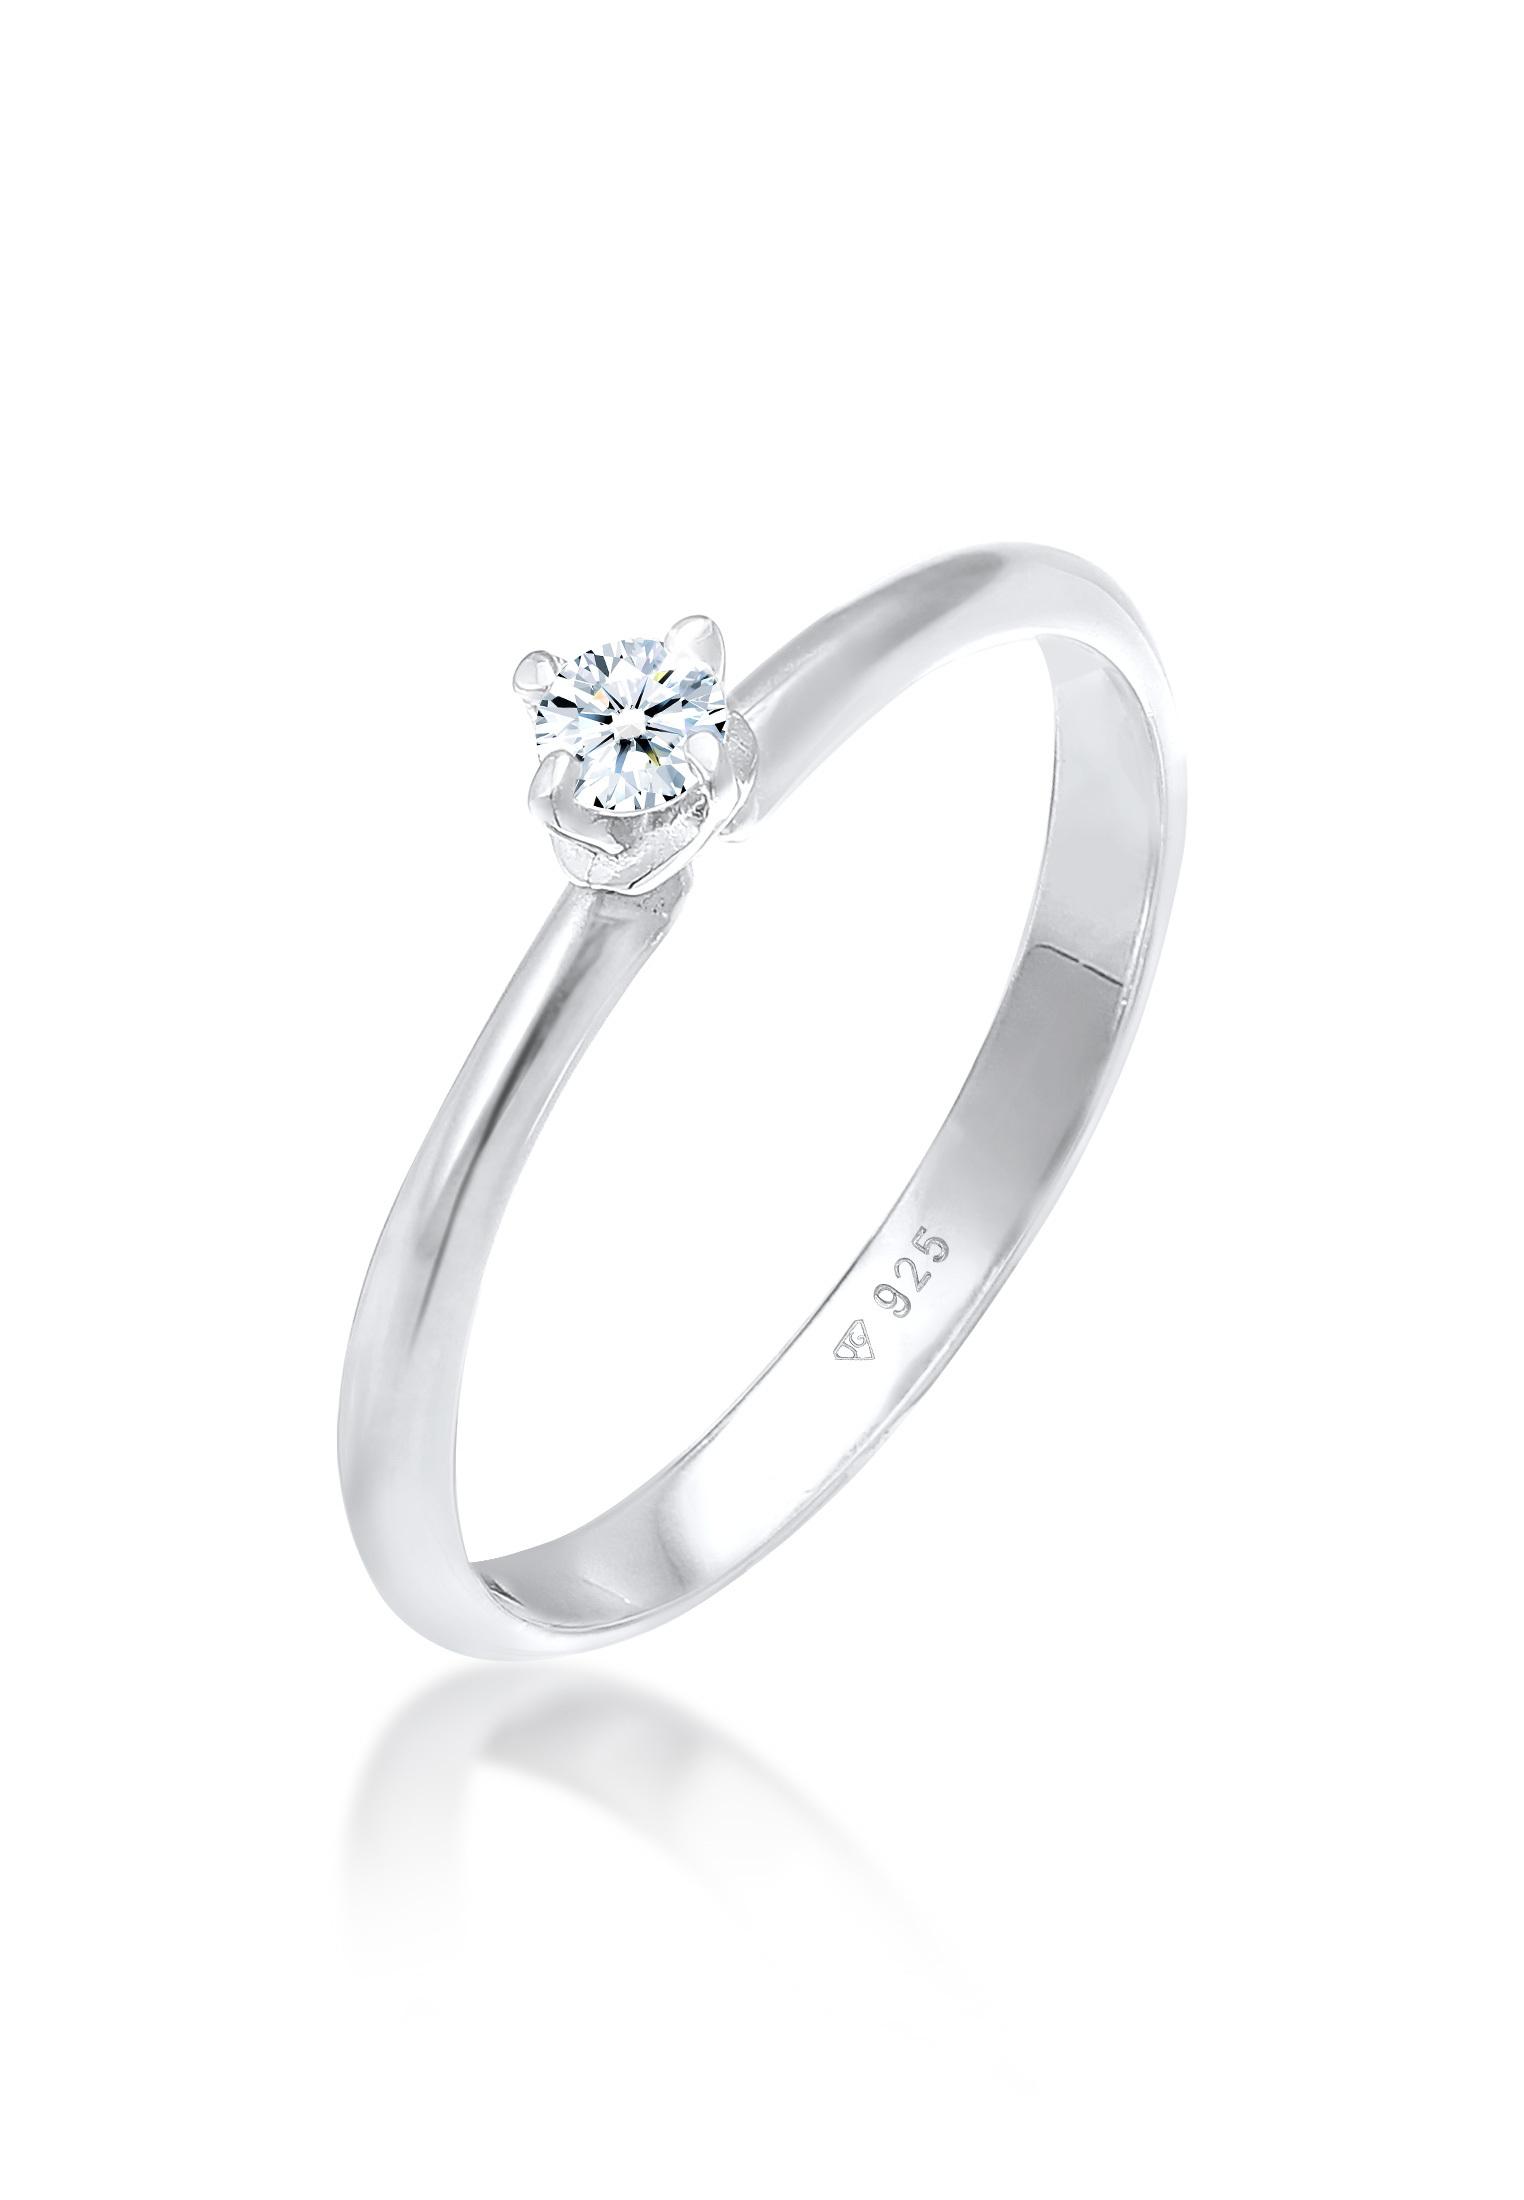 Verlobungsring Solitär Klassisch | Diamant (0.11 ct.) | 925er Sterling Silber